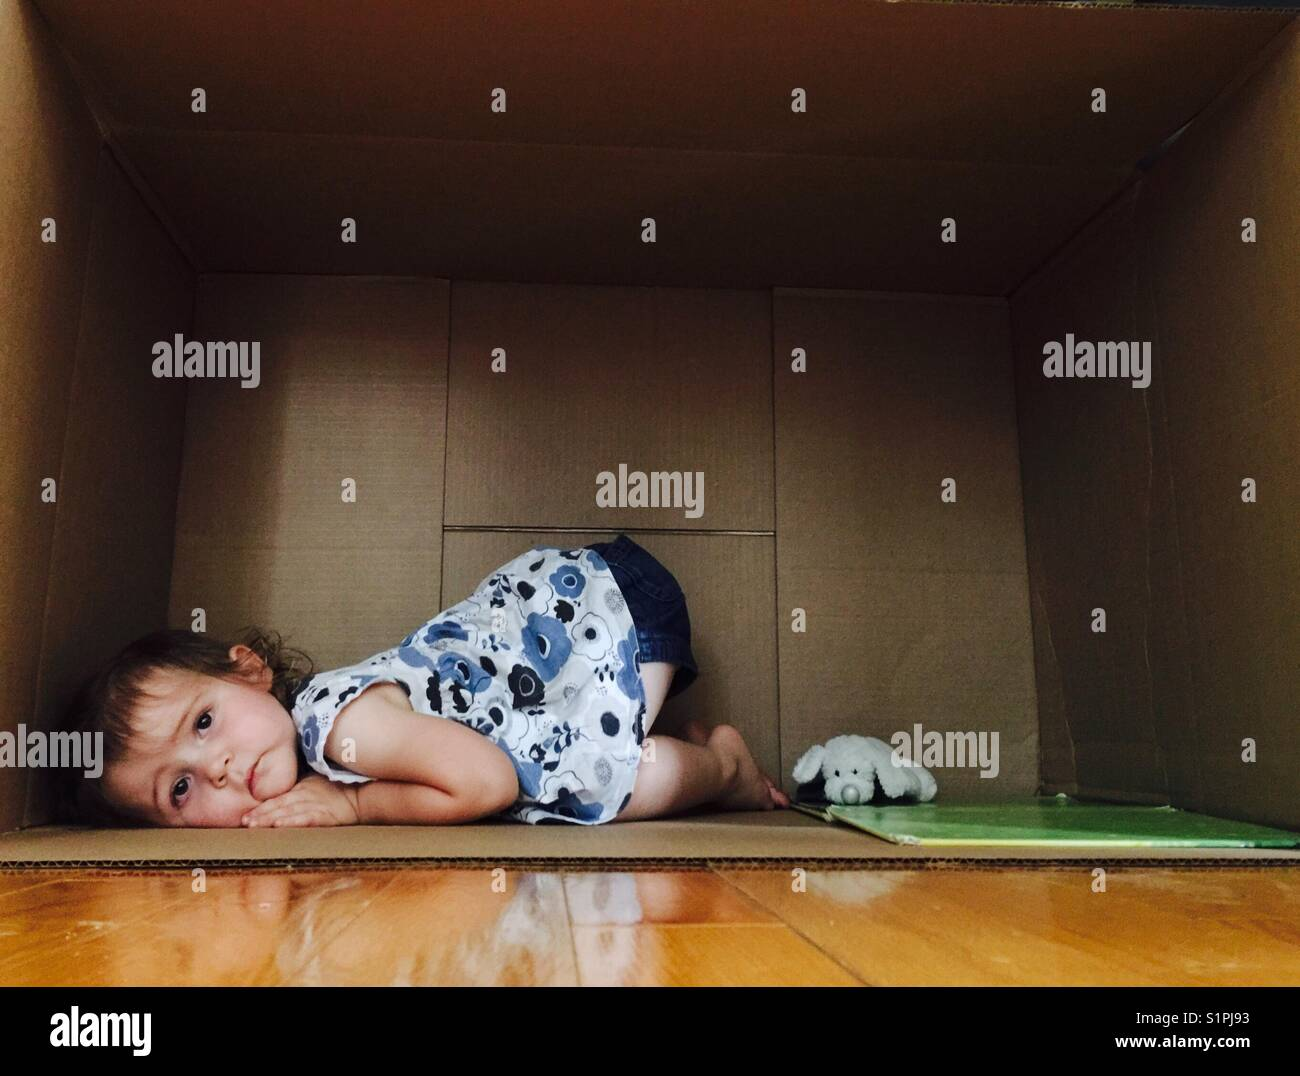 Sad girl dans une boîte en carton Photo Stock